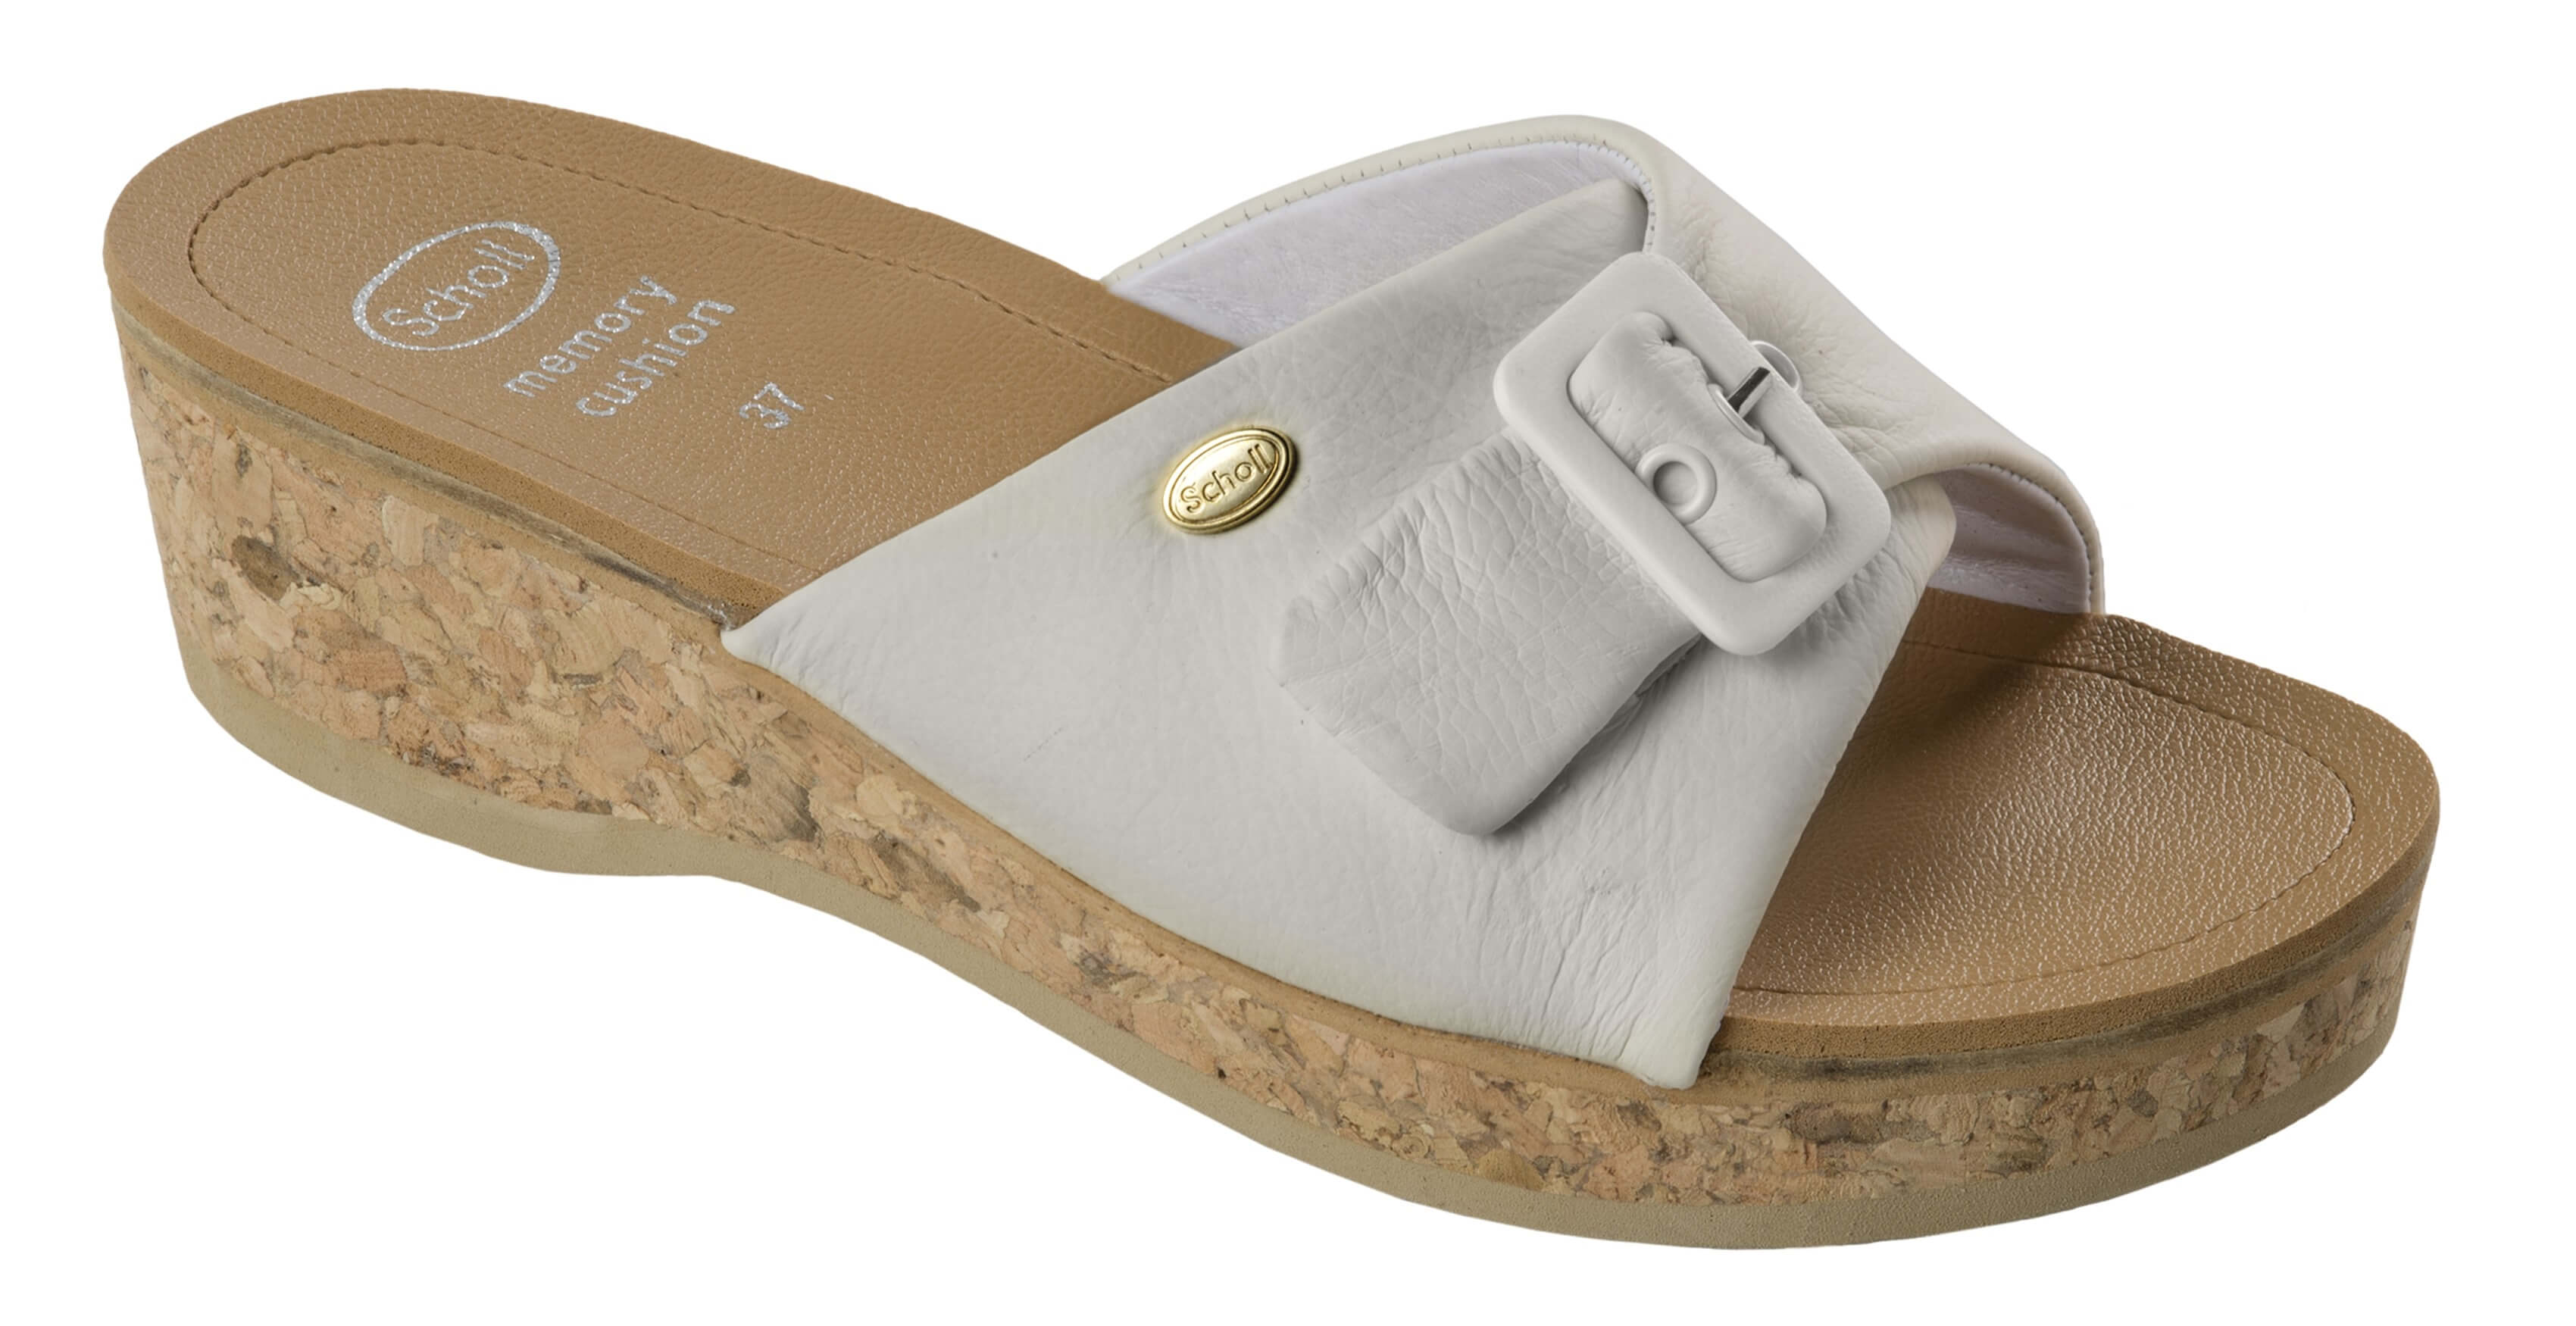 Scholl Zdravotní obuv WAPPY Lea - bílá Doprava ZDARMA  359c1f1b00